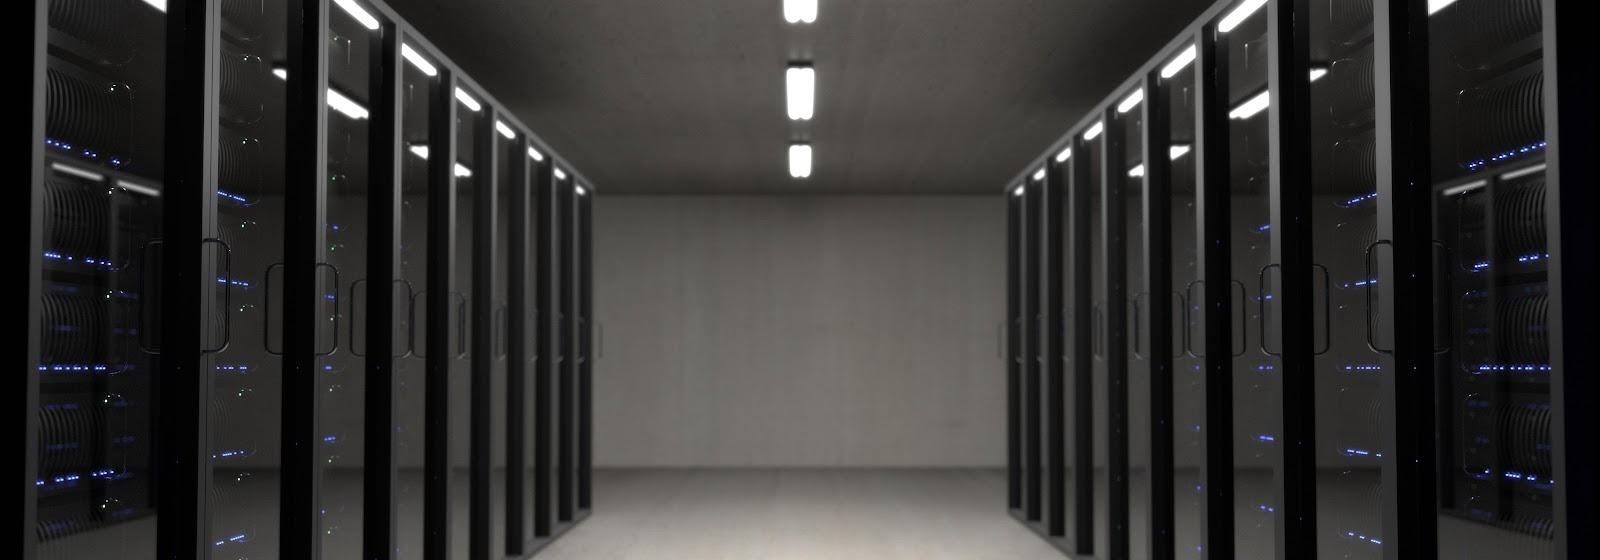 aws server infrastructure